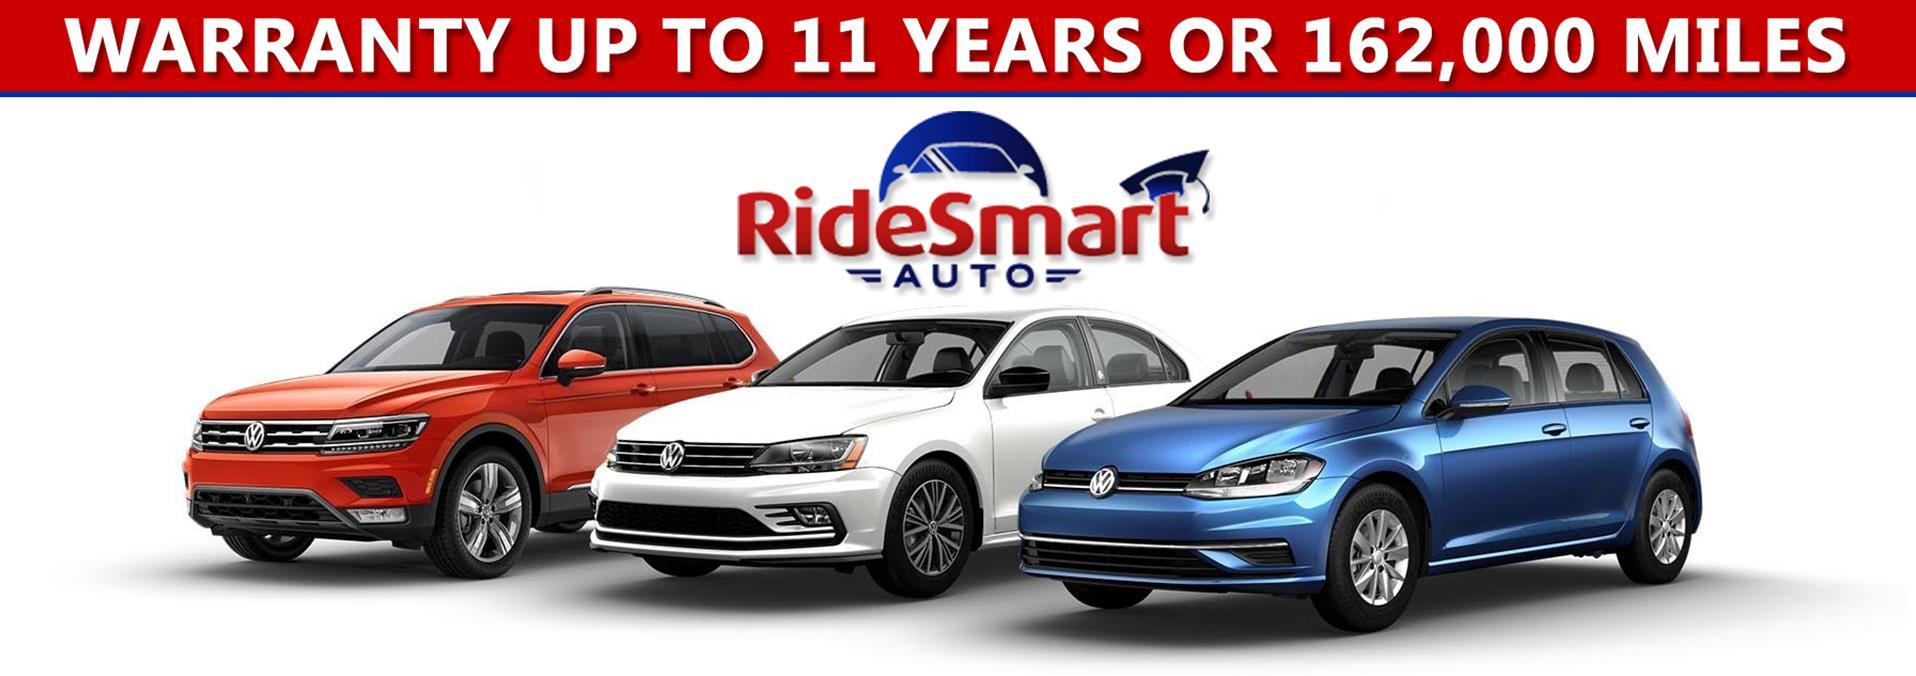 Rt 31 Auto Sales >> Used Cars Downingtown Pa Used Cars Trucks Pa Ridesmart